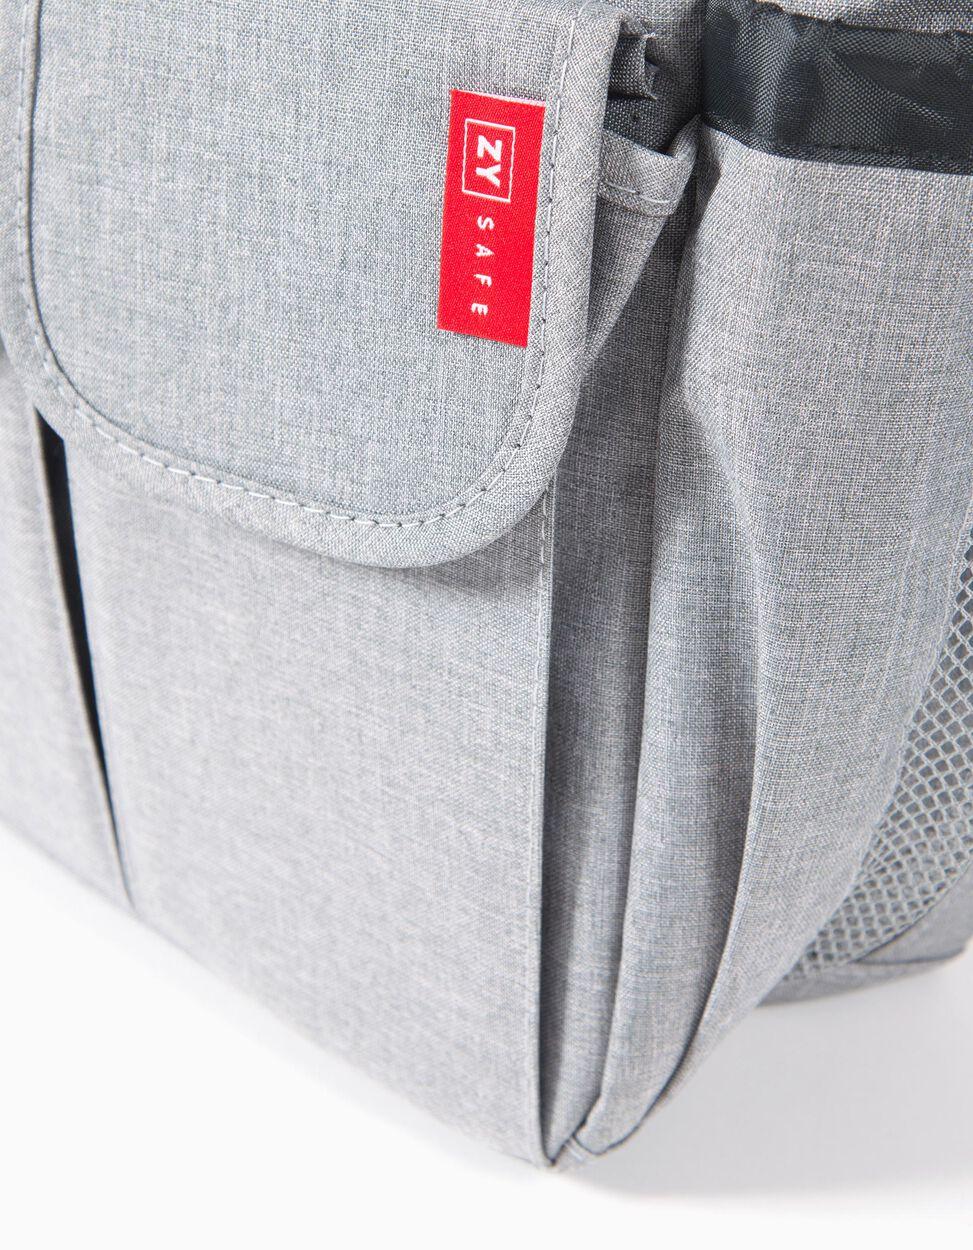 Bolso de Pañales 35x42x11 cm Pocket Zy Safe